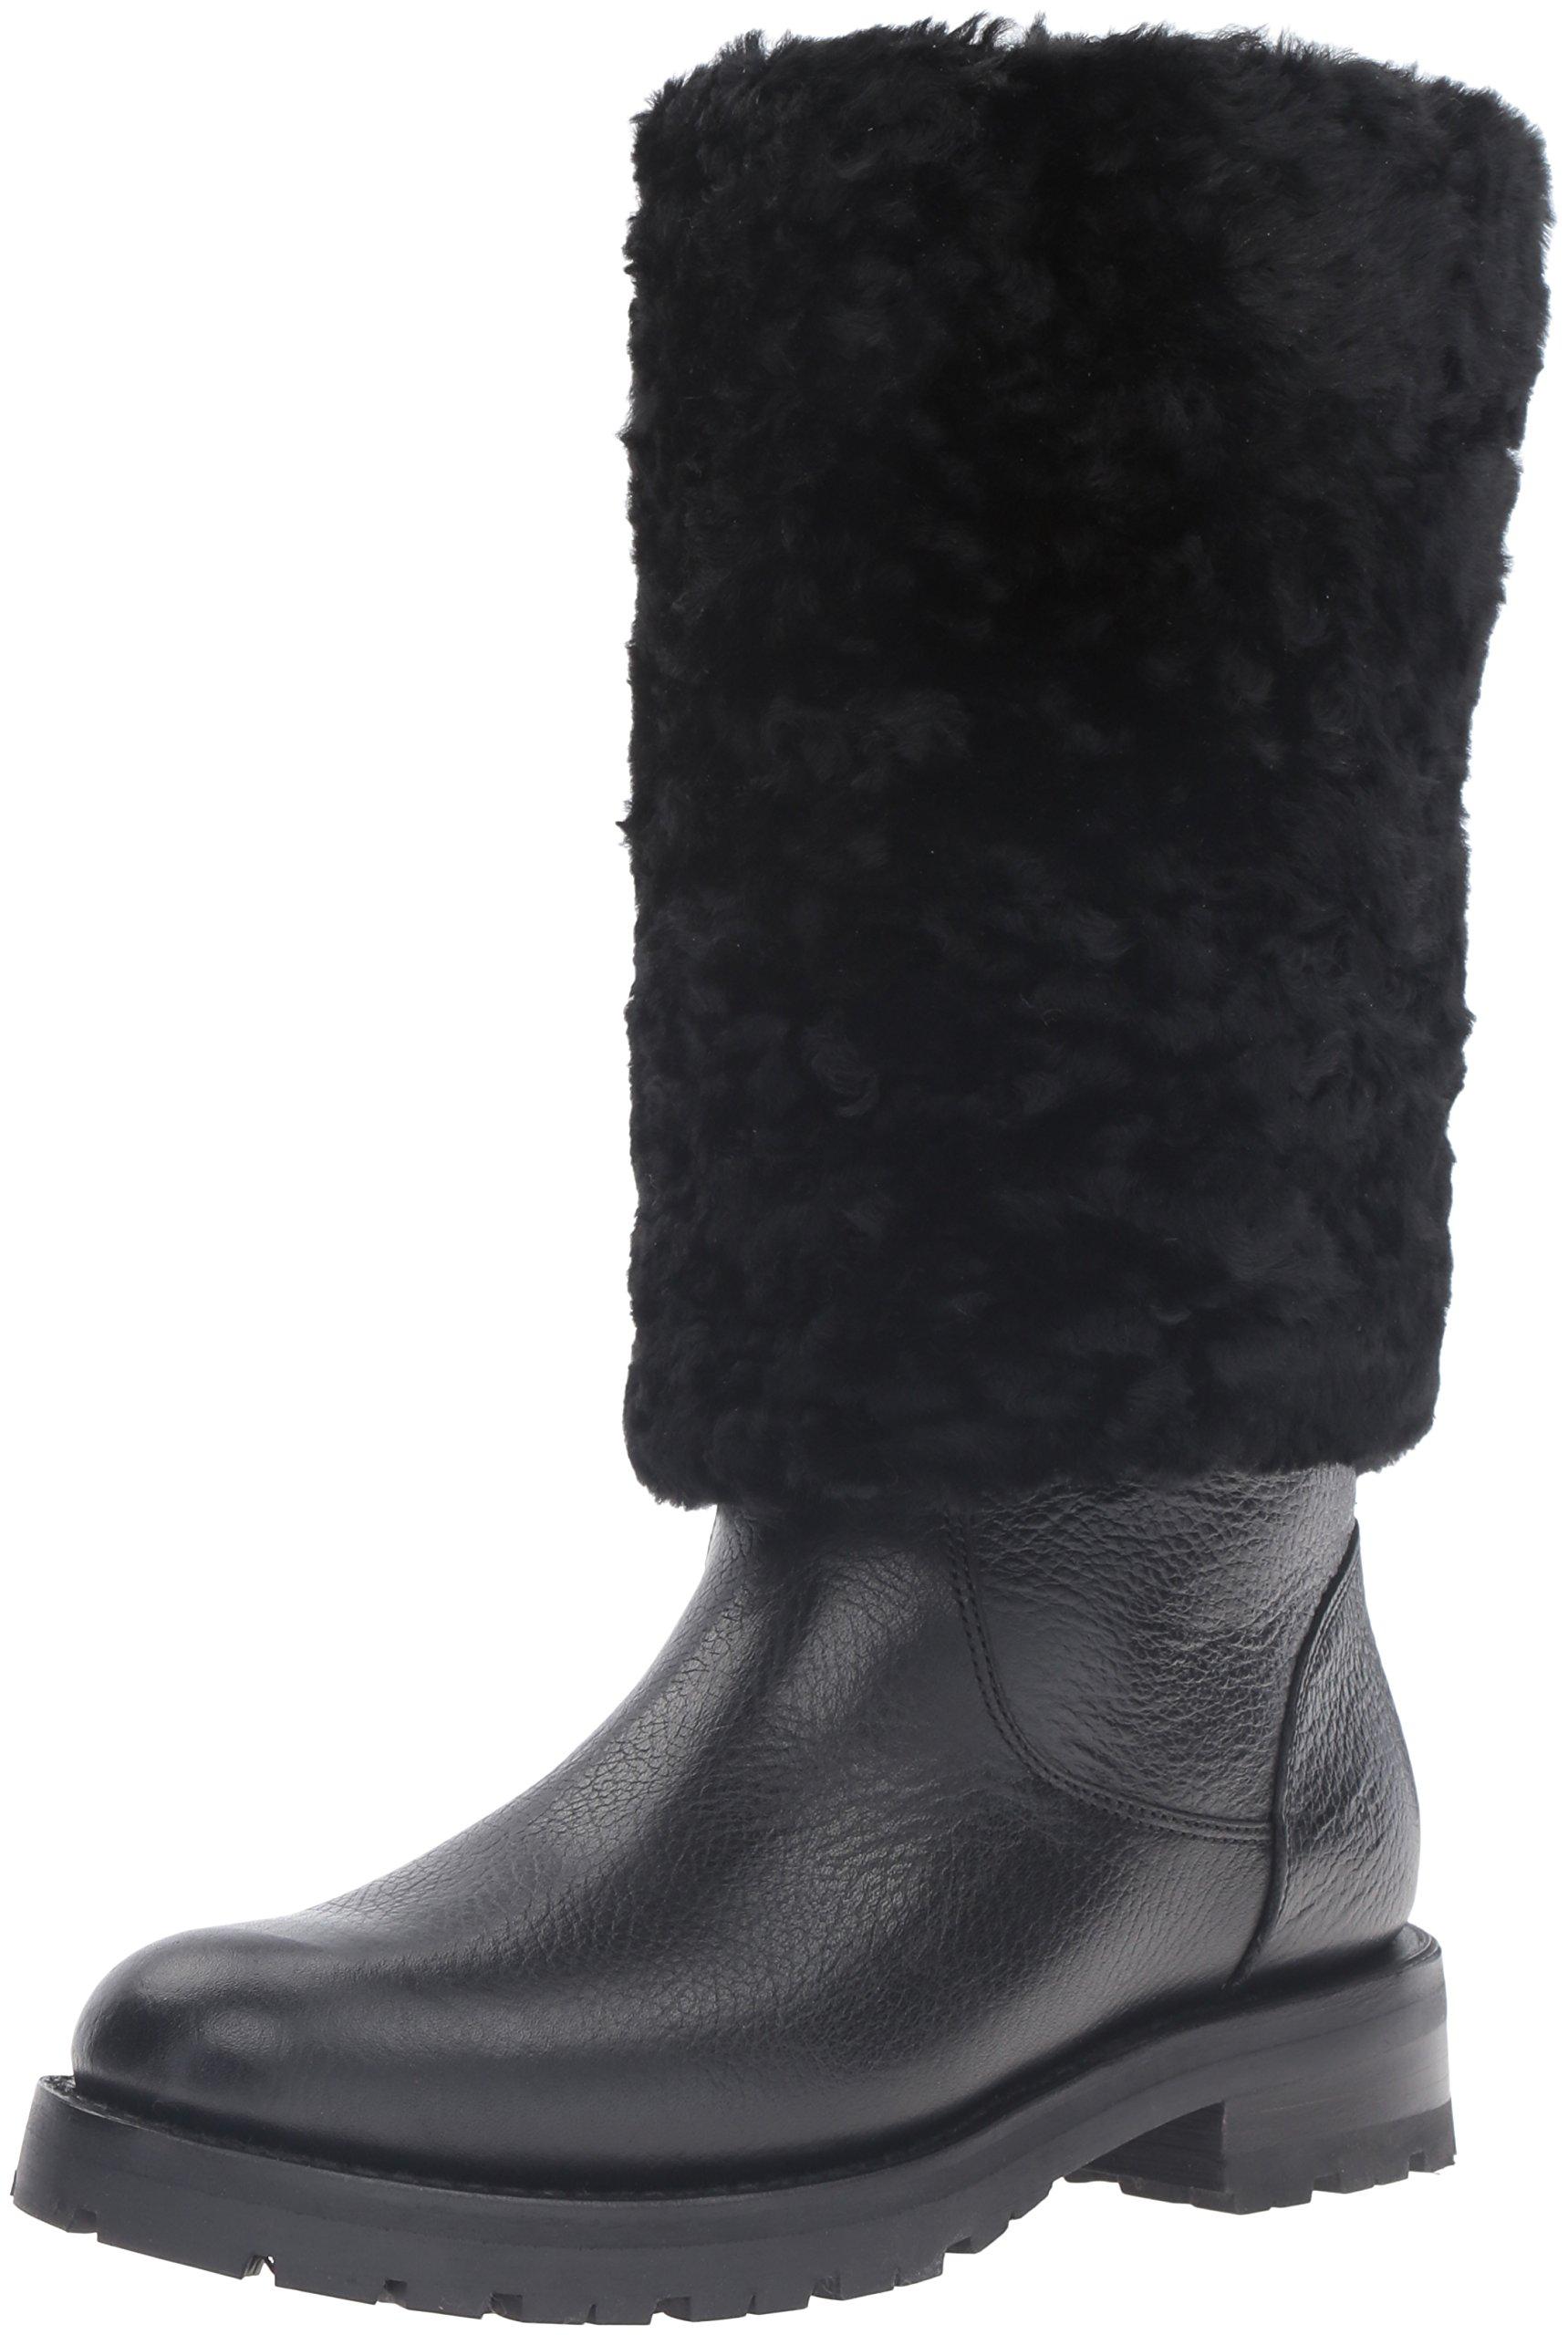 FRYE Women's Natalie Cuff Lug Winter Boot, Black, 8 M US